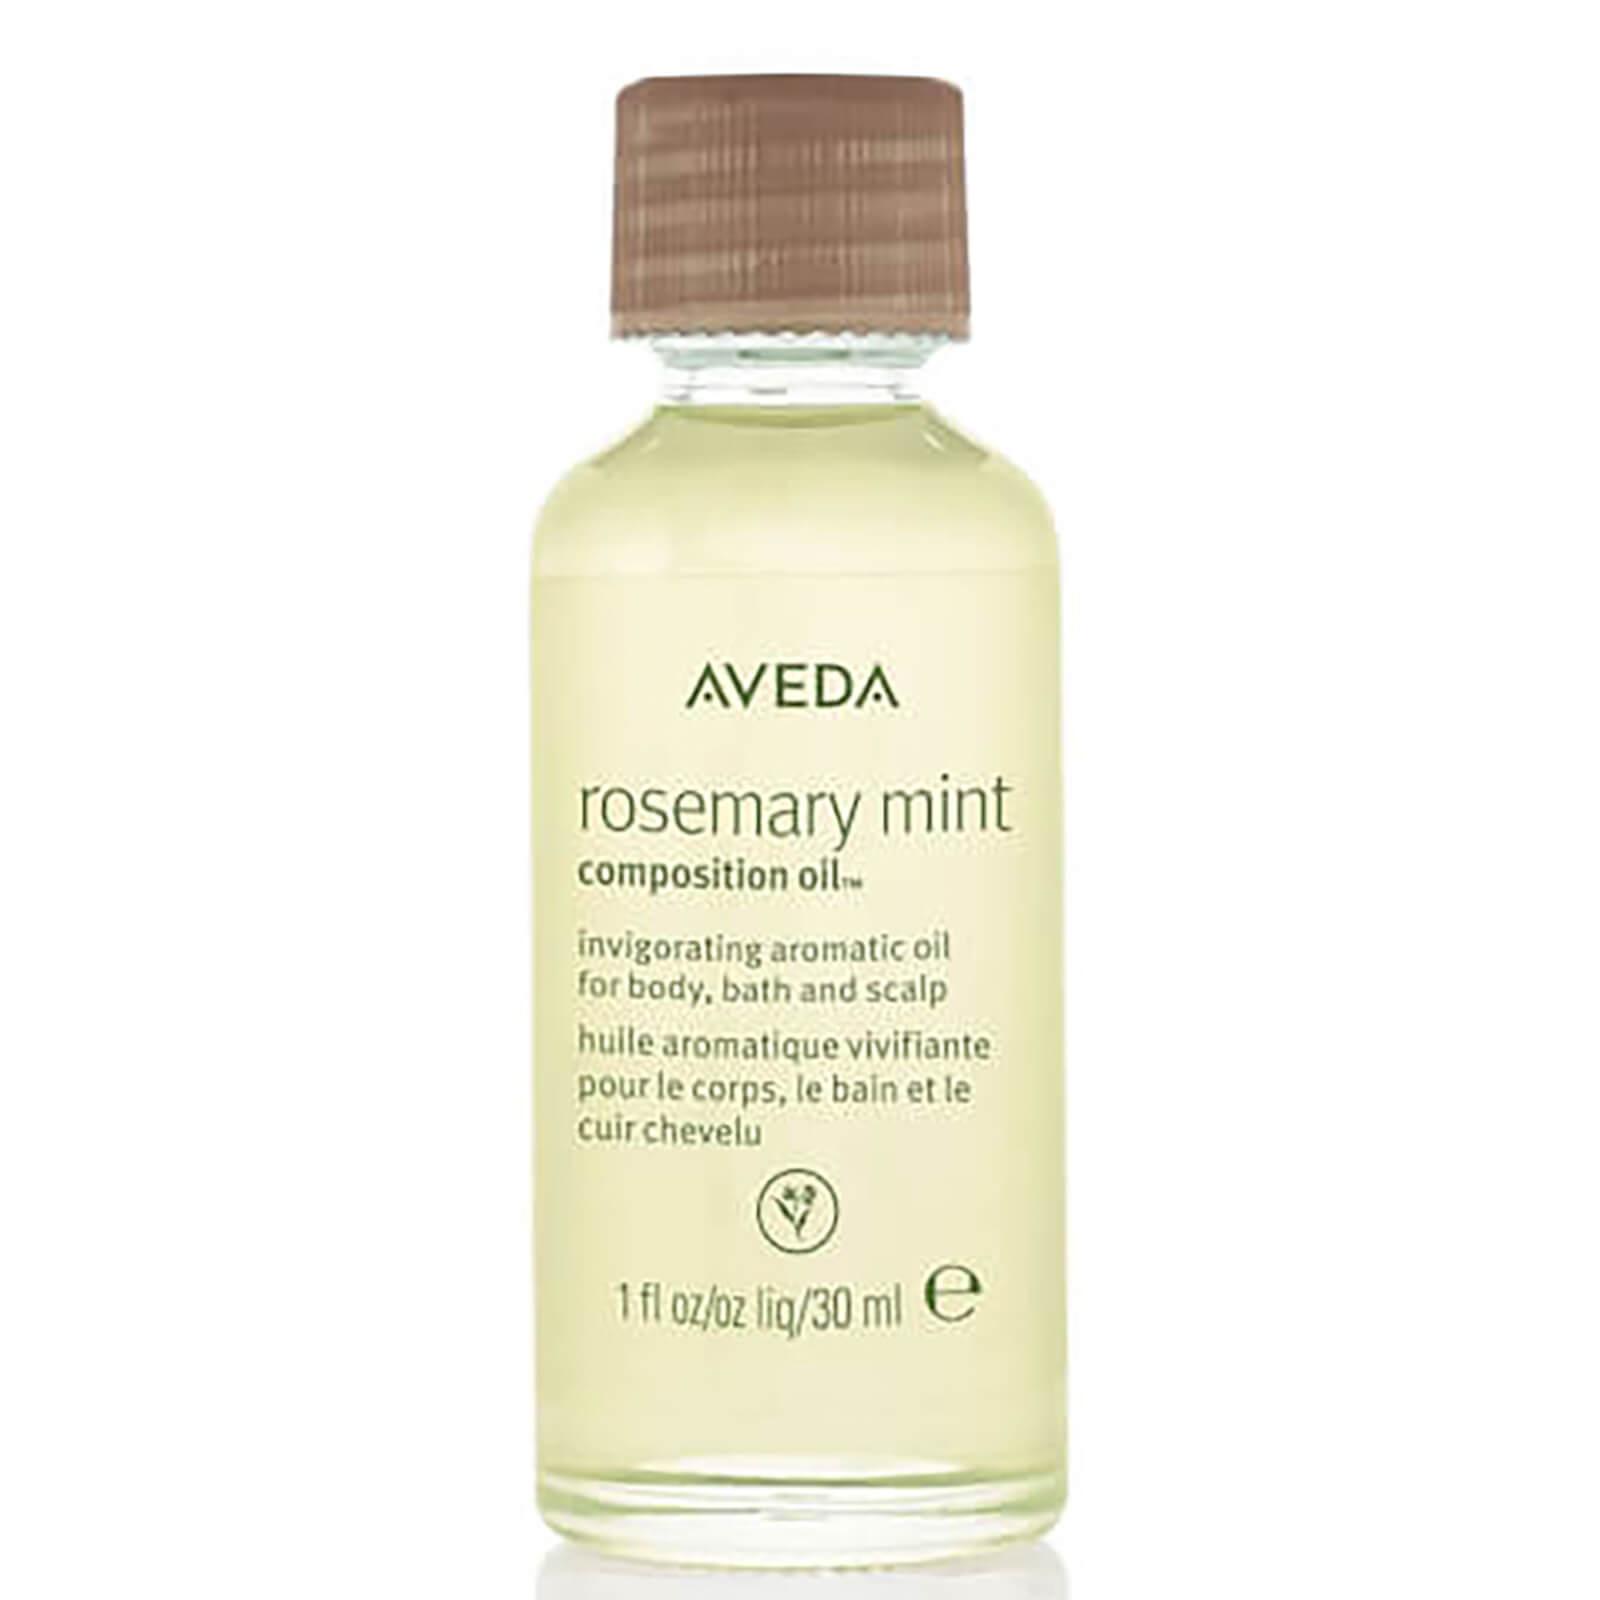 Aveda Huile aromatique vivifiante Rosemary Mint